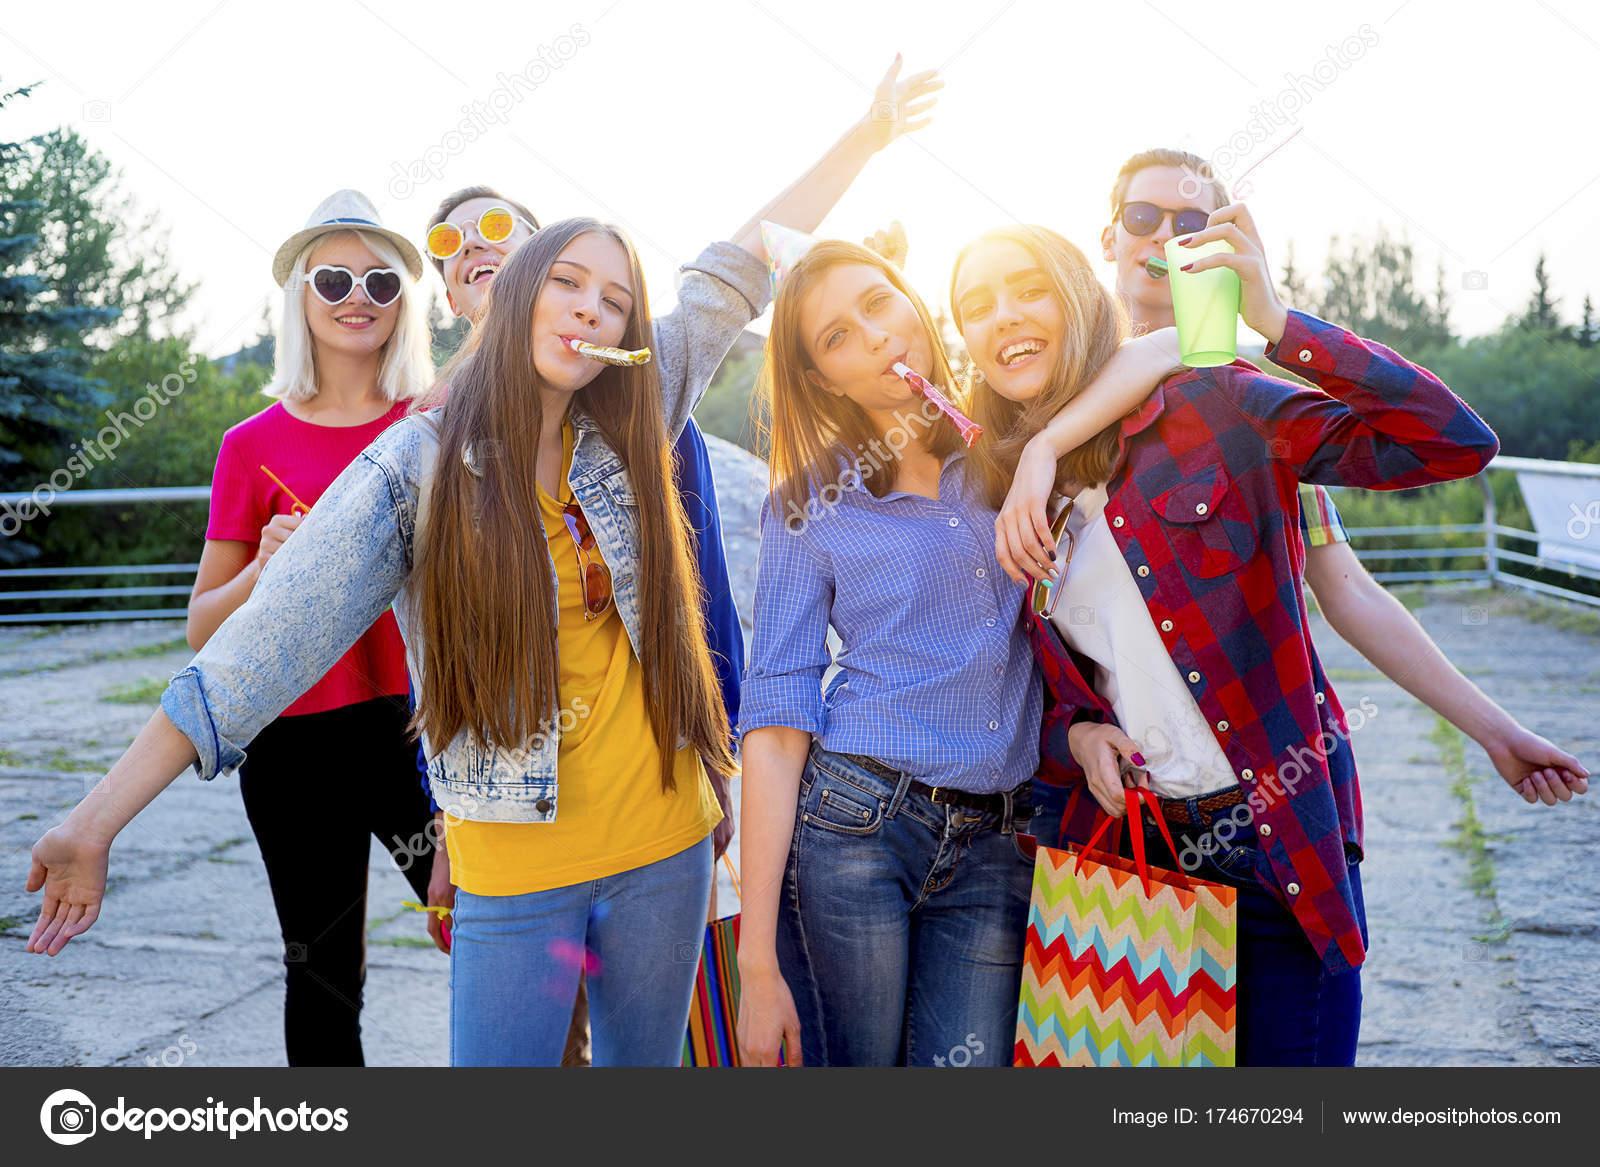 Jugendliche mit einer party — Stockfoto © Lenanichizhenova #174670294